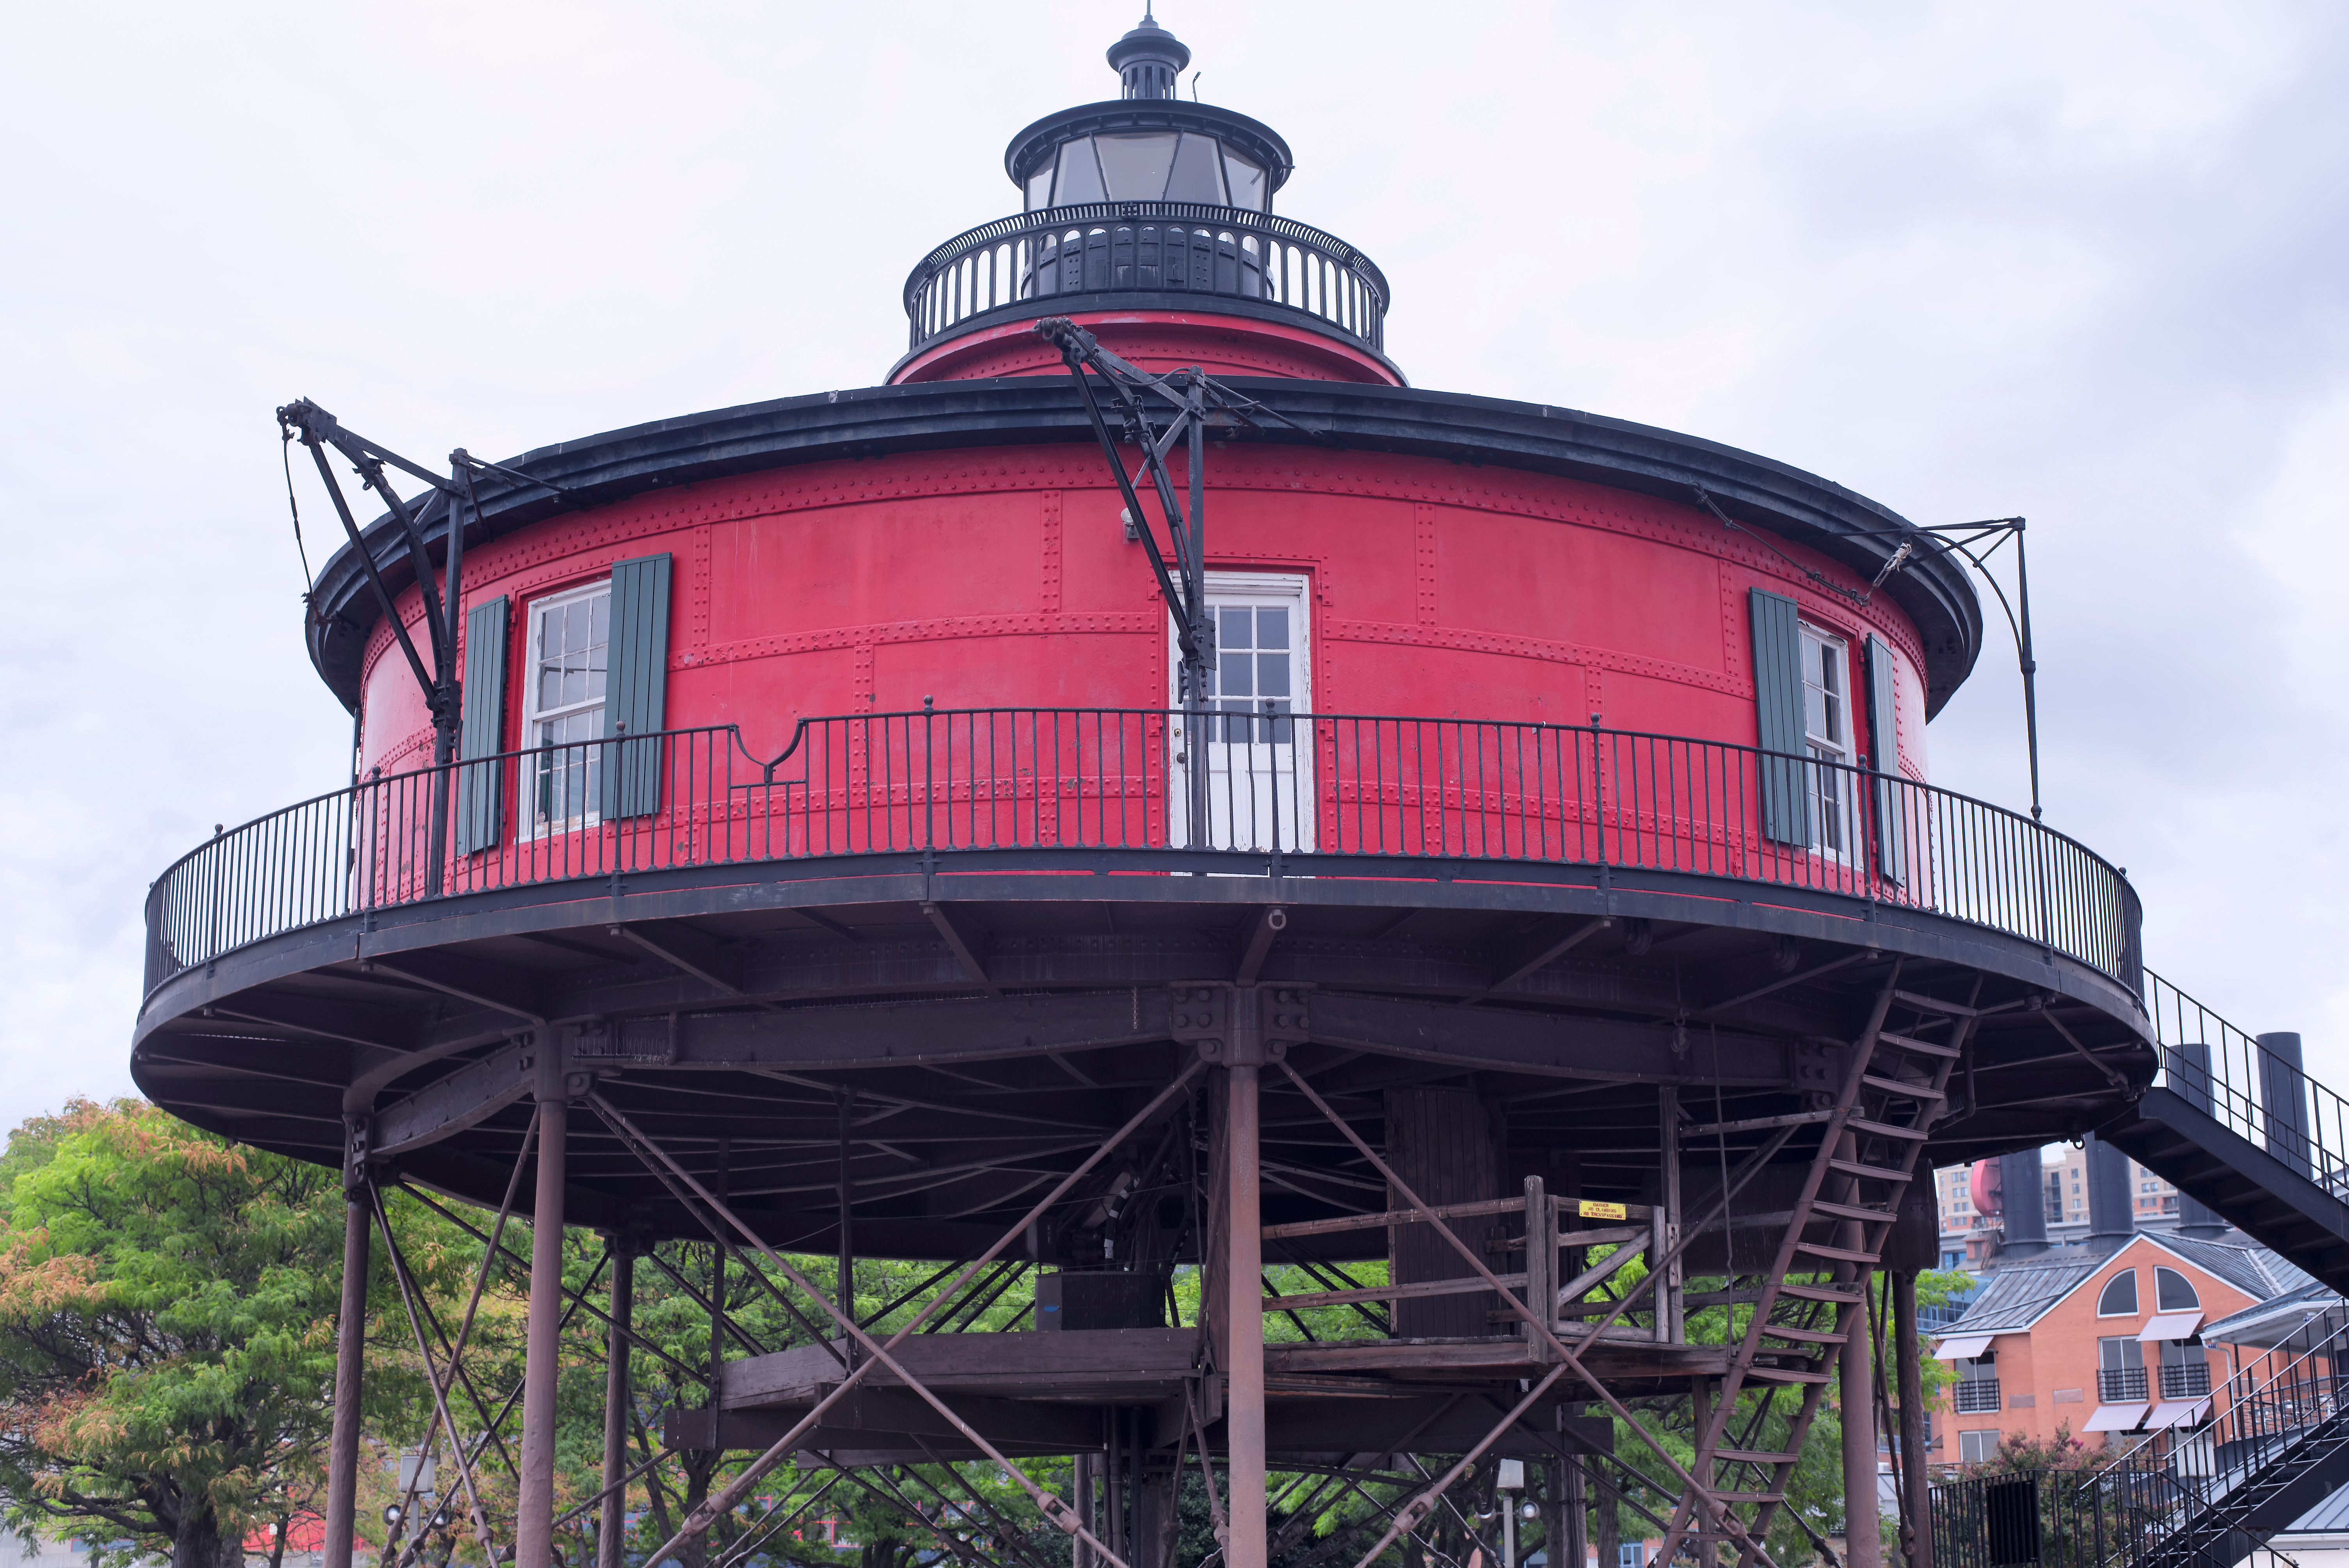 the historic red and black landmark seve